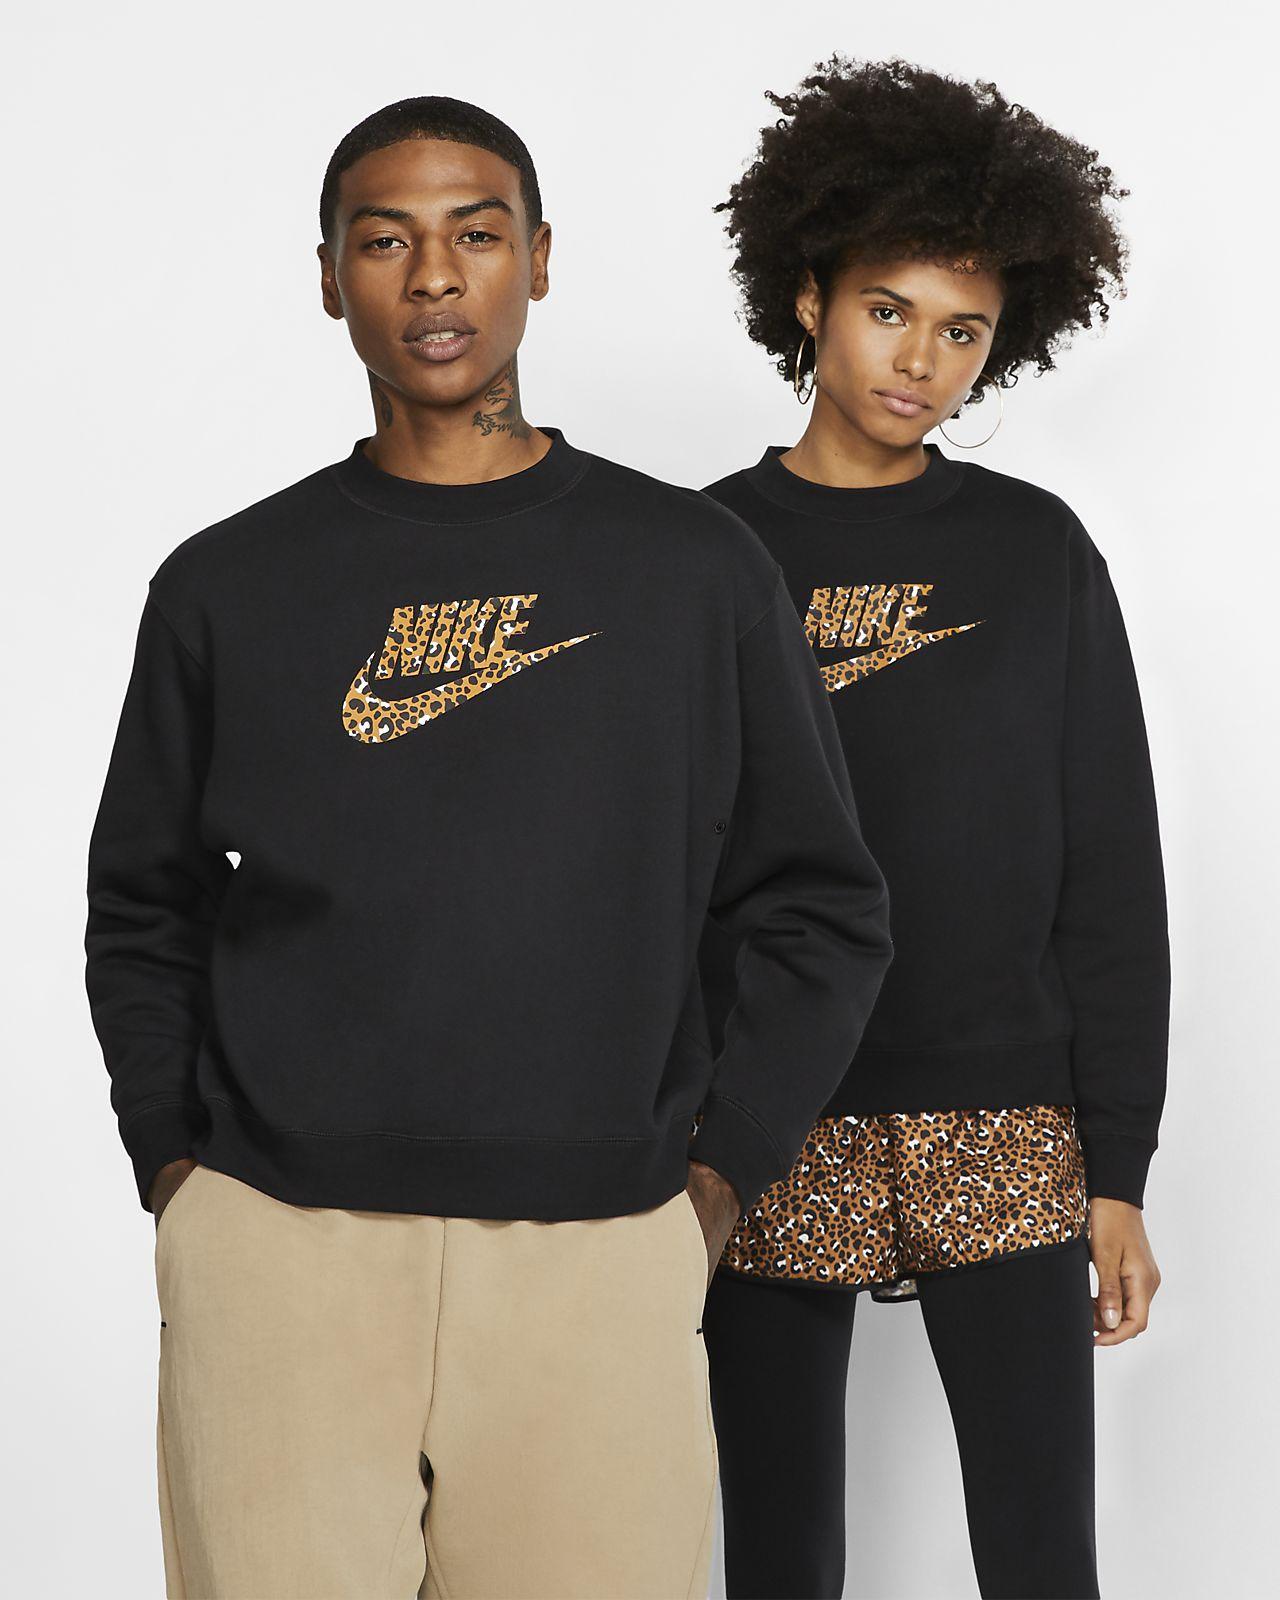 fef9370f29 Nike Sportswear Animal Print Women s Crew. Nike.com